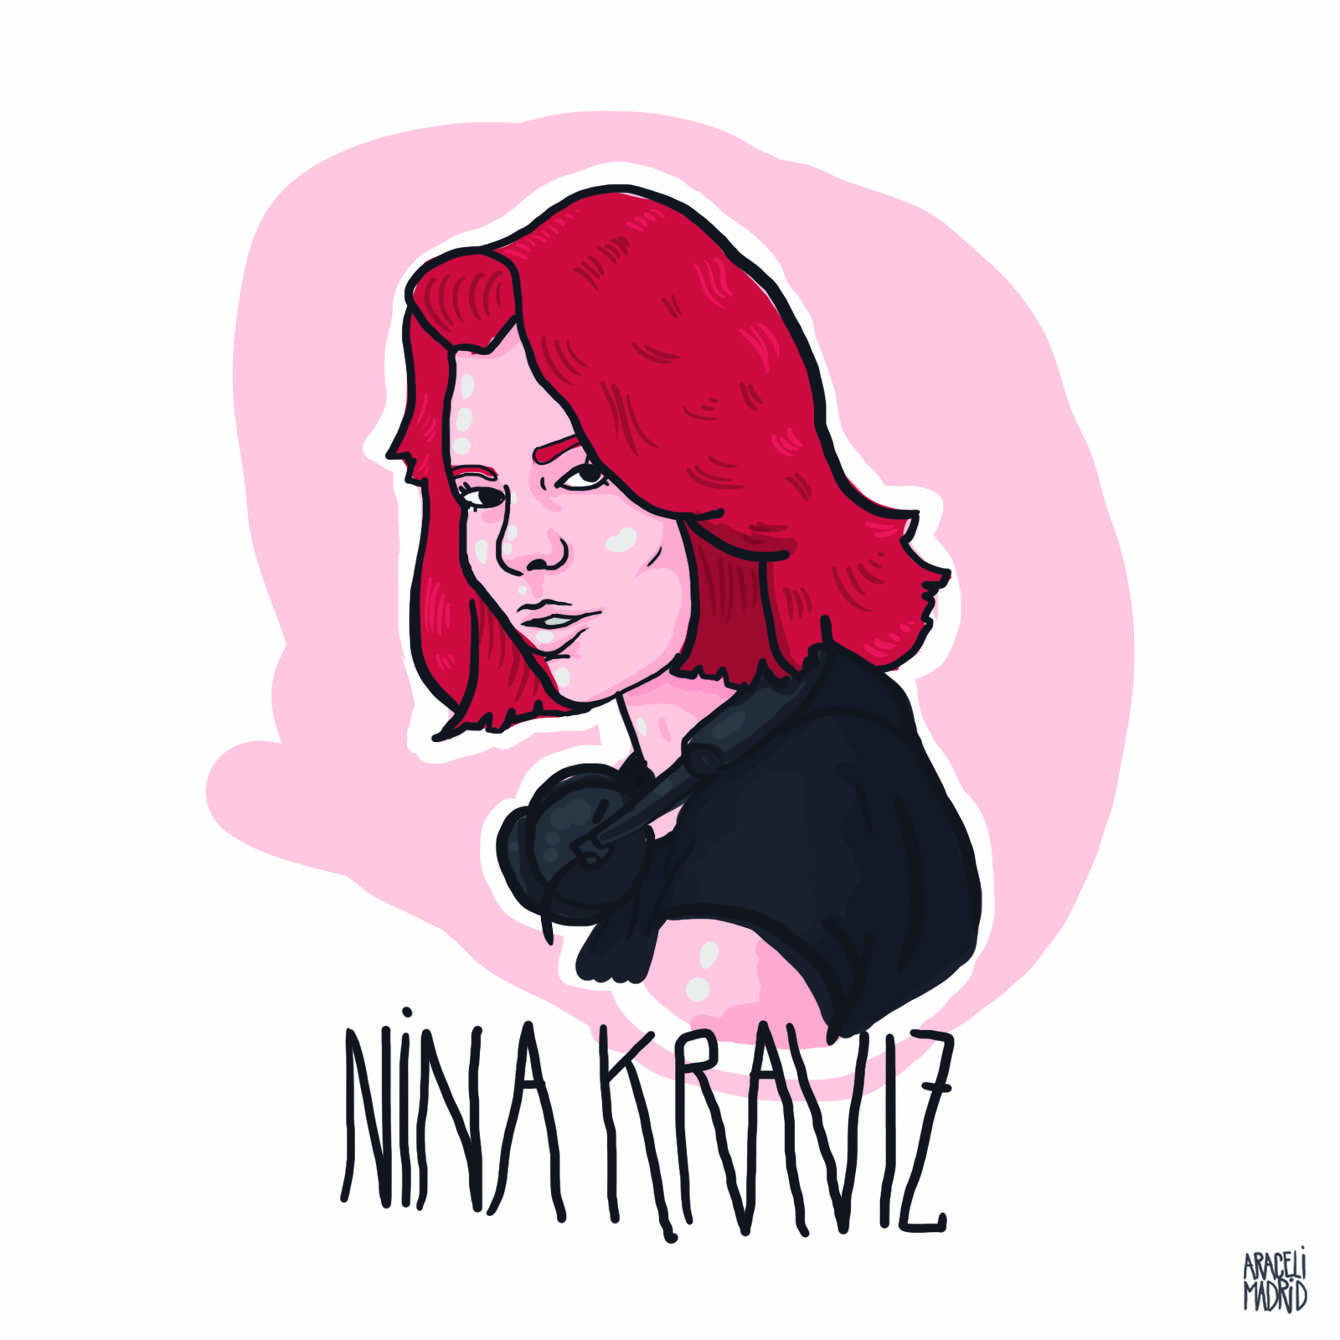 Nina Kraviz Djs ilustrados